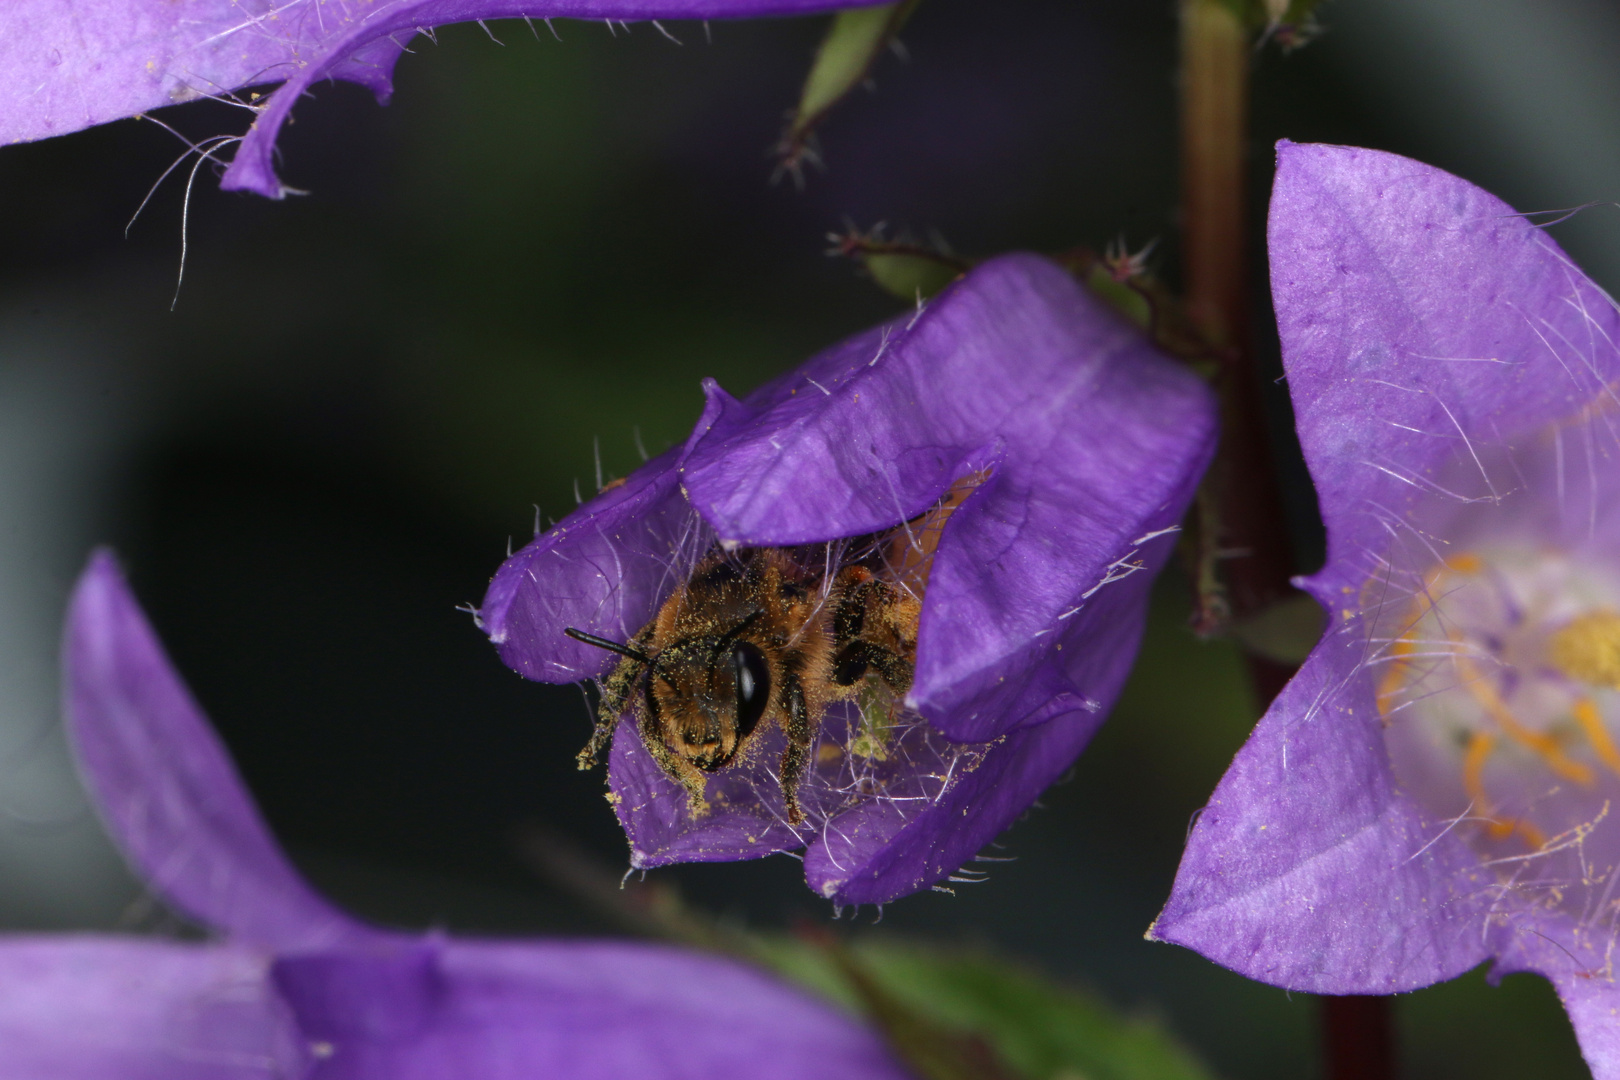 Glockenblumen-Sägehornbiene Melitta haemorrhoidalis